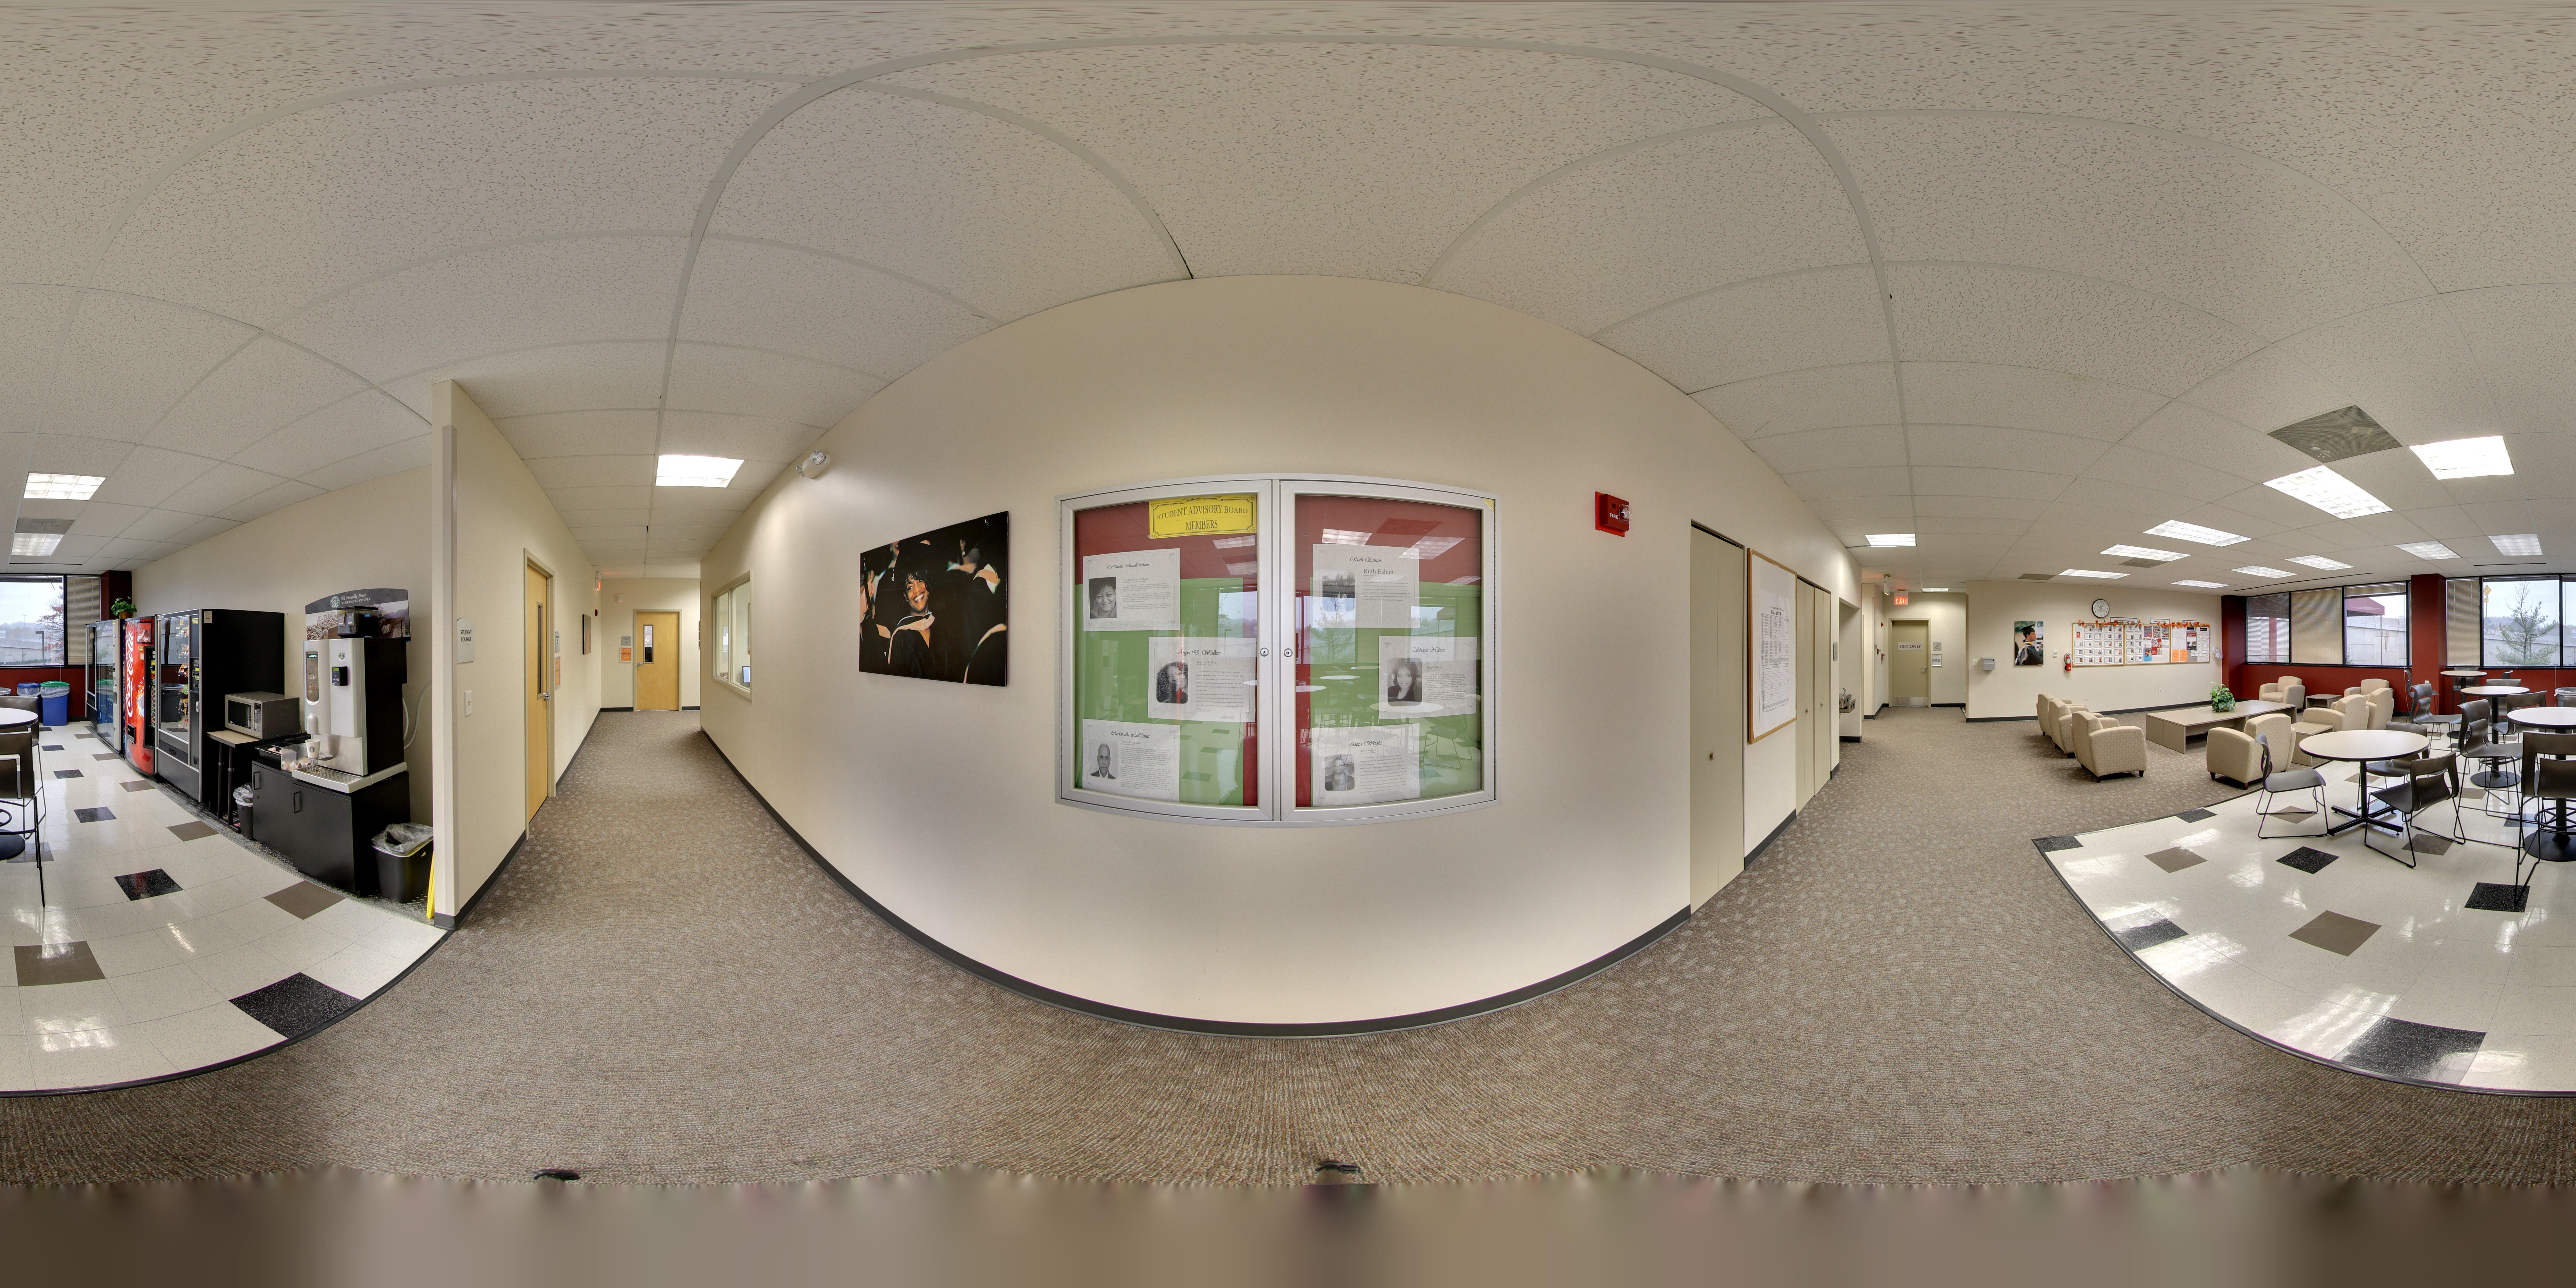 Strayer University image 44